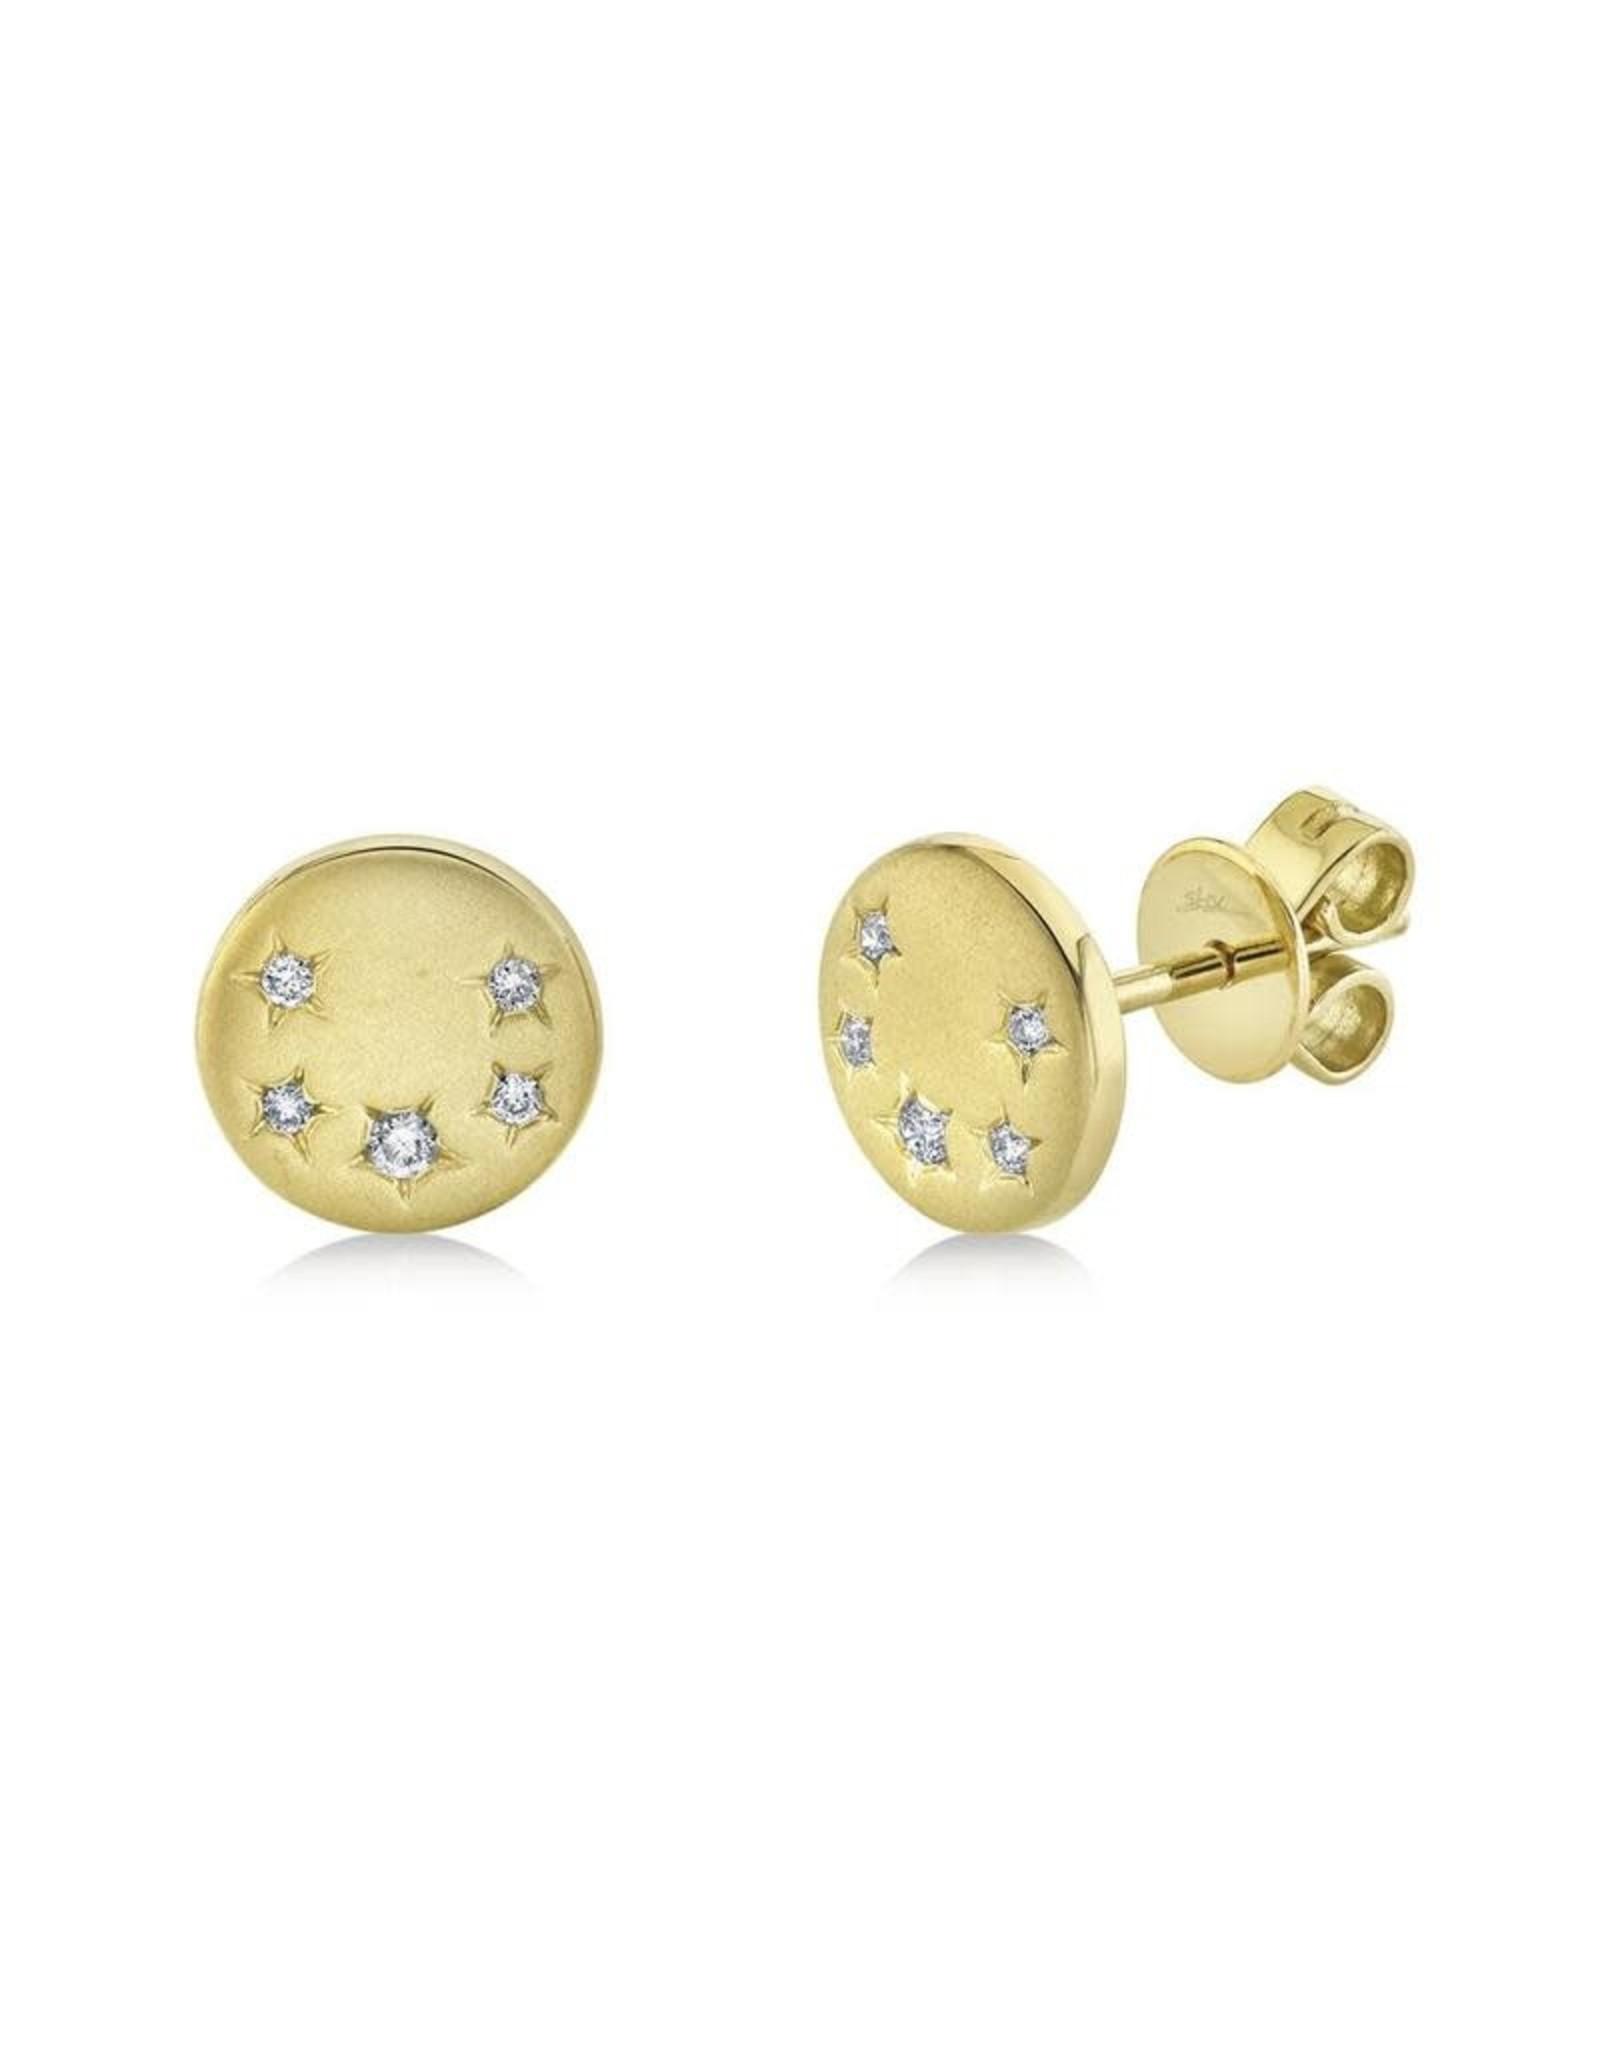 14K Yellow Gold Diamond Stardust Stud Earrings, D: 0.07ct